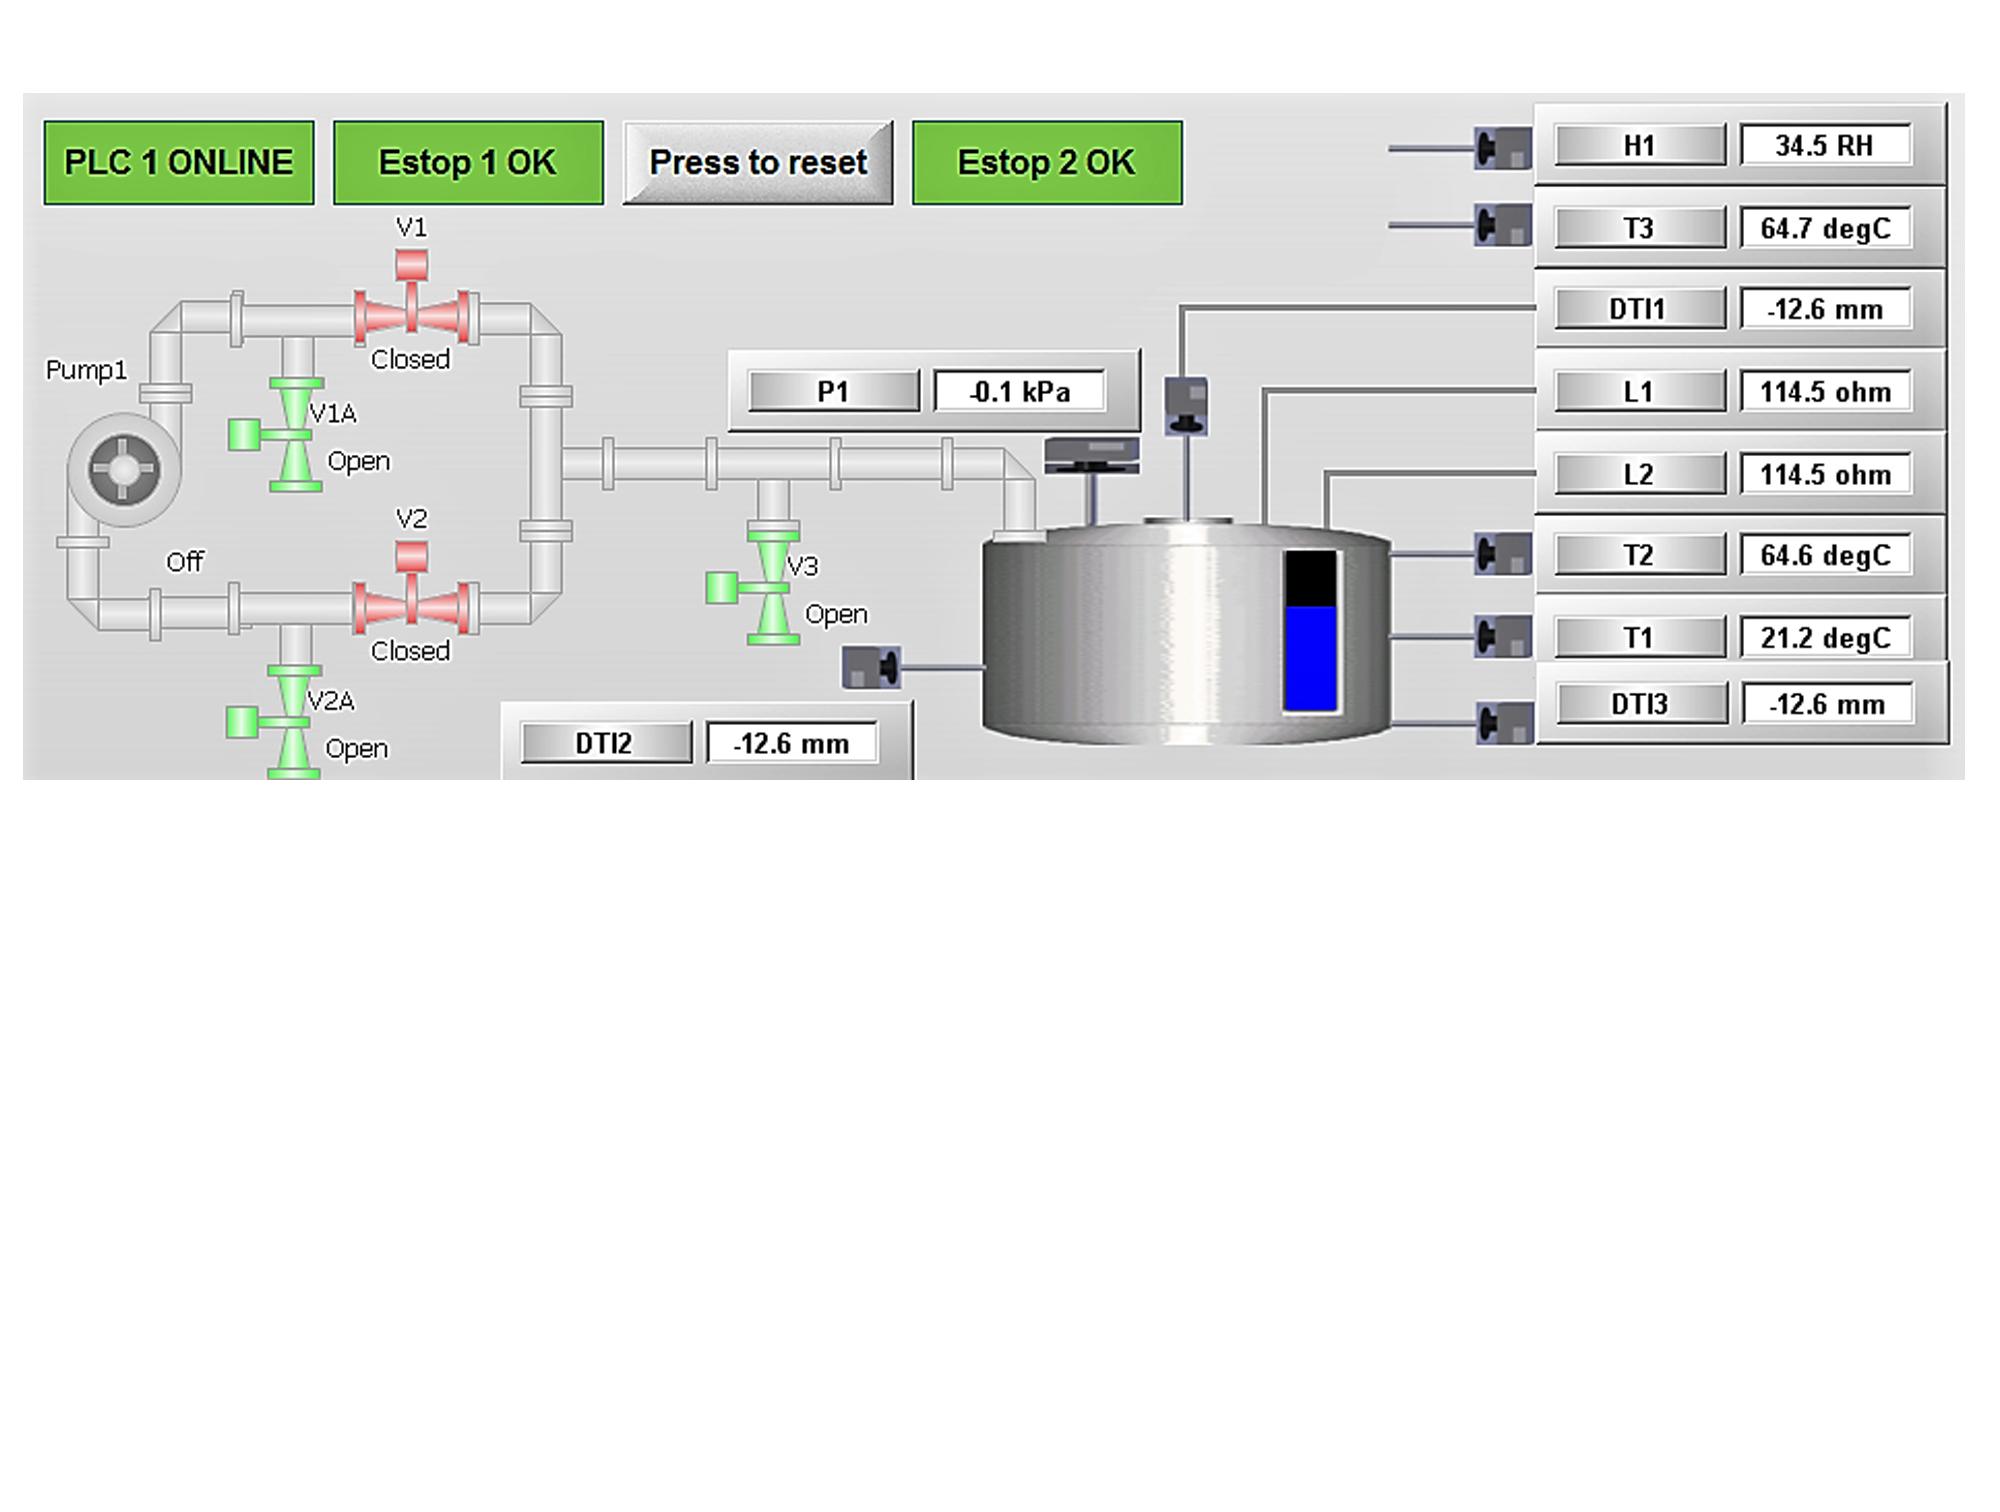 How KC - Process Control and Measurement Instrumentation problems